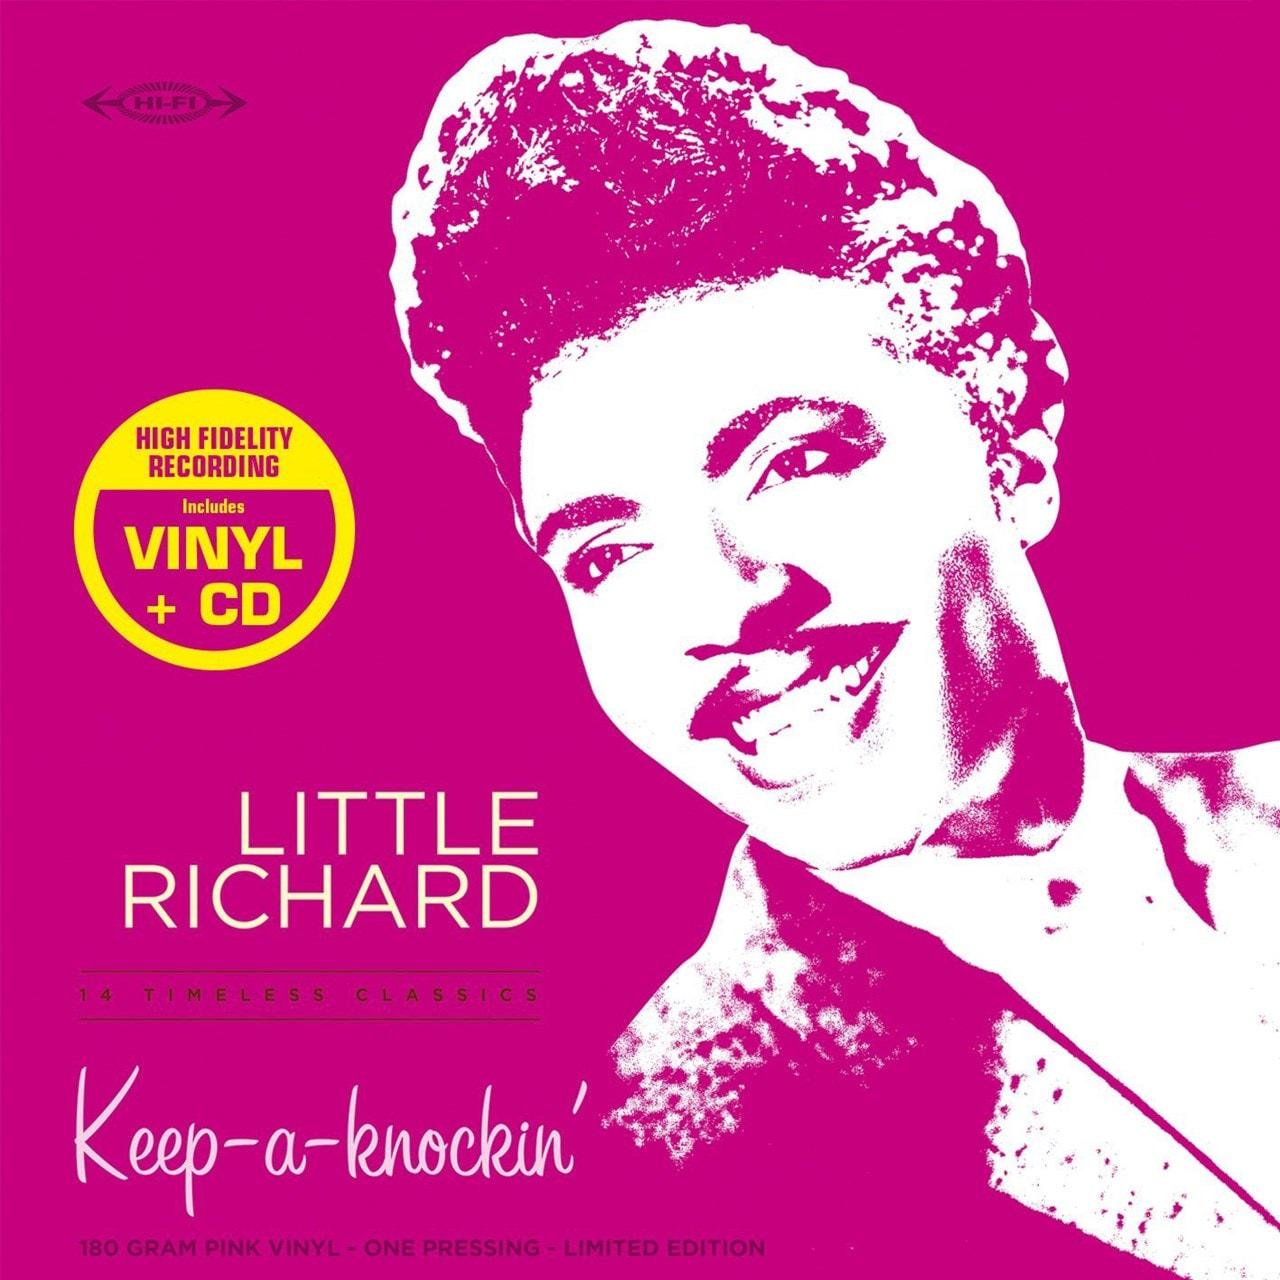 Keep-a-knockin': The Very Best of Little Richard - 1